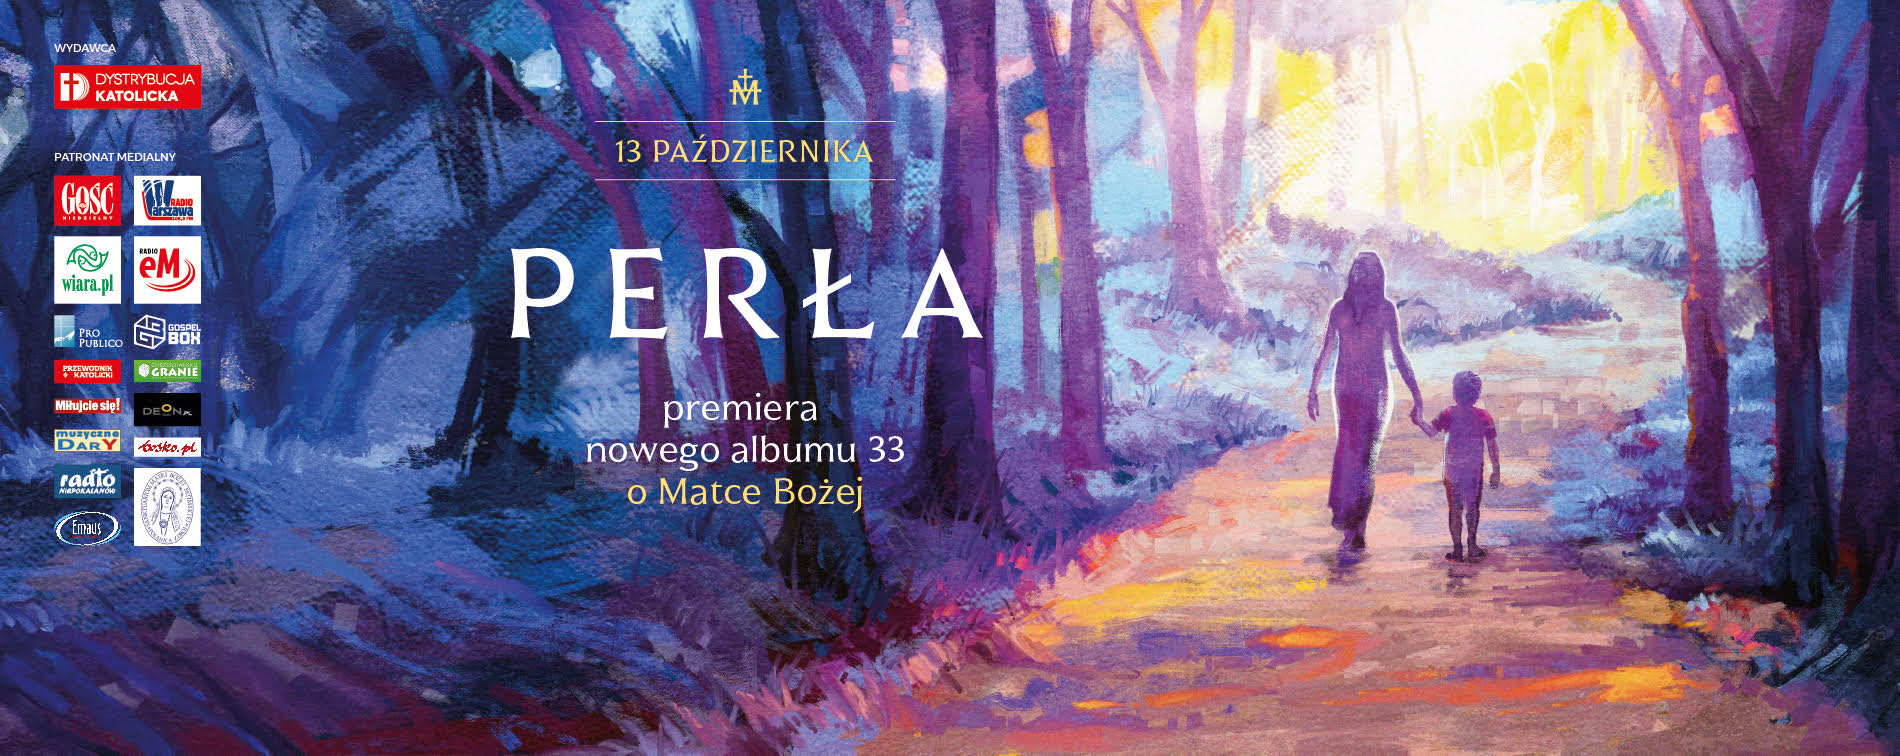 Zespół 33 - Perła